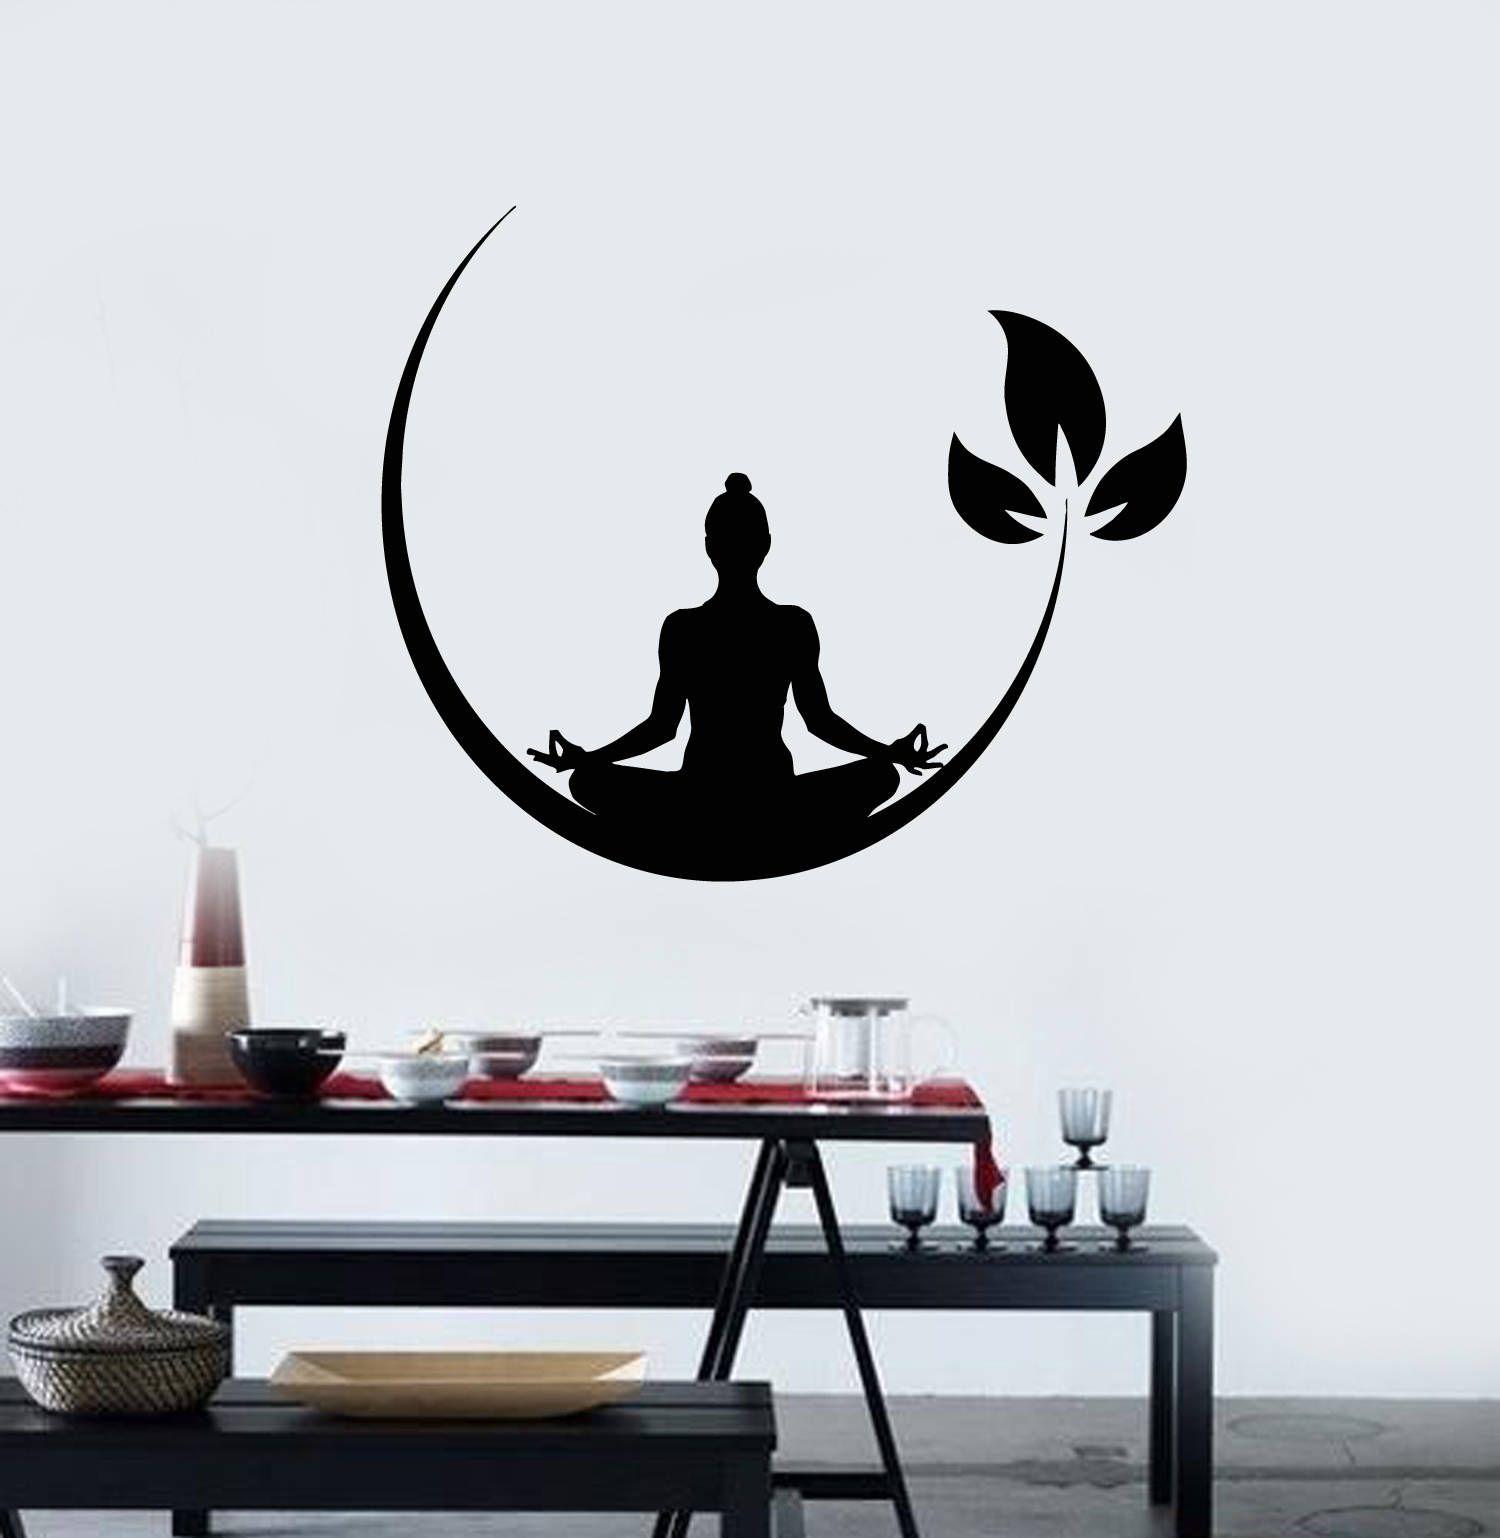 Vinyl Wall Decal Meditation Pose Buddhism Yoga Studio Stickers Etsy Simple Wall Paintings Buddha Wall Art Vinyl Wall Decals